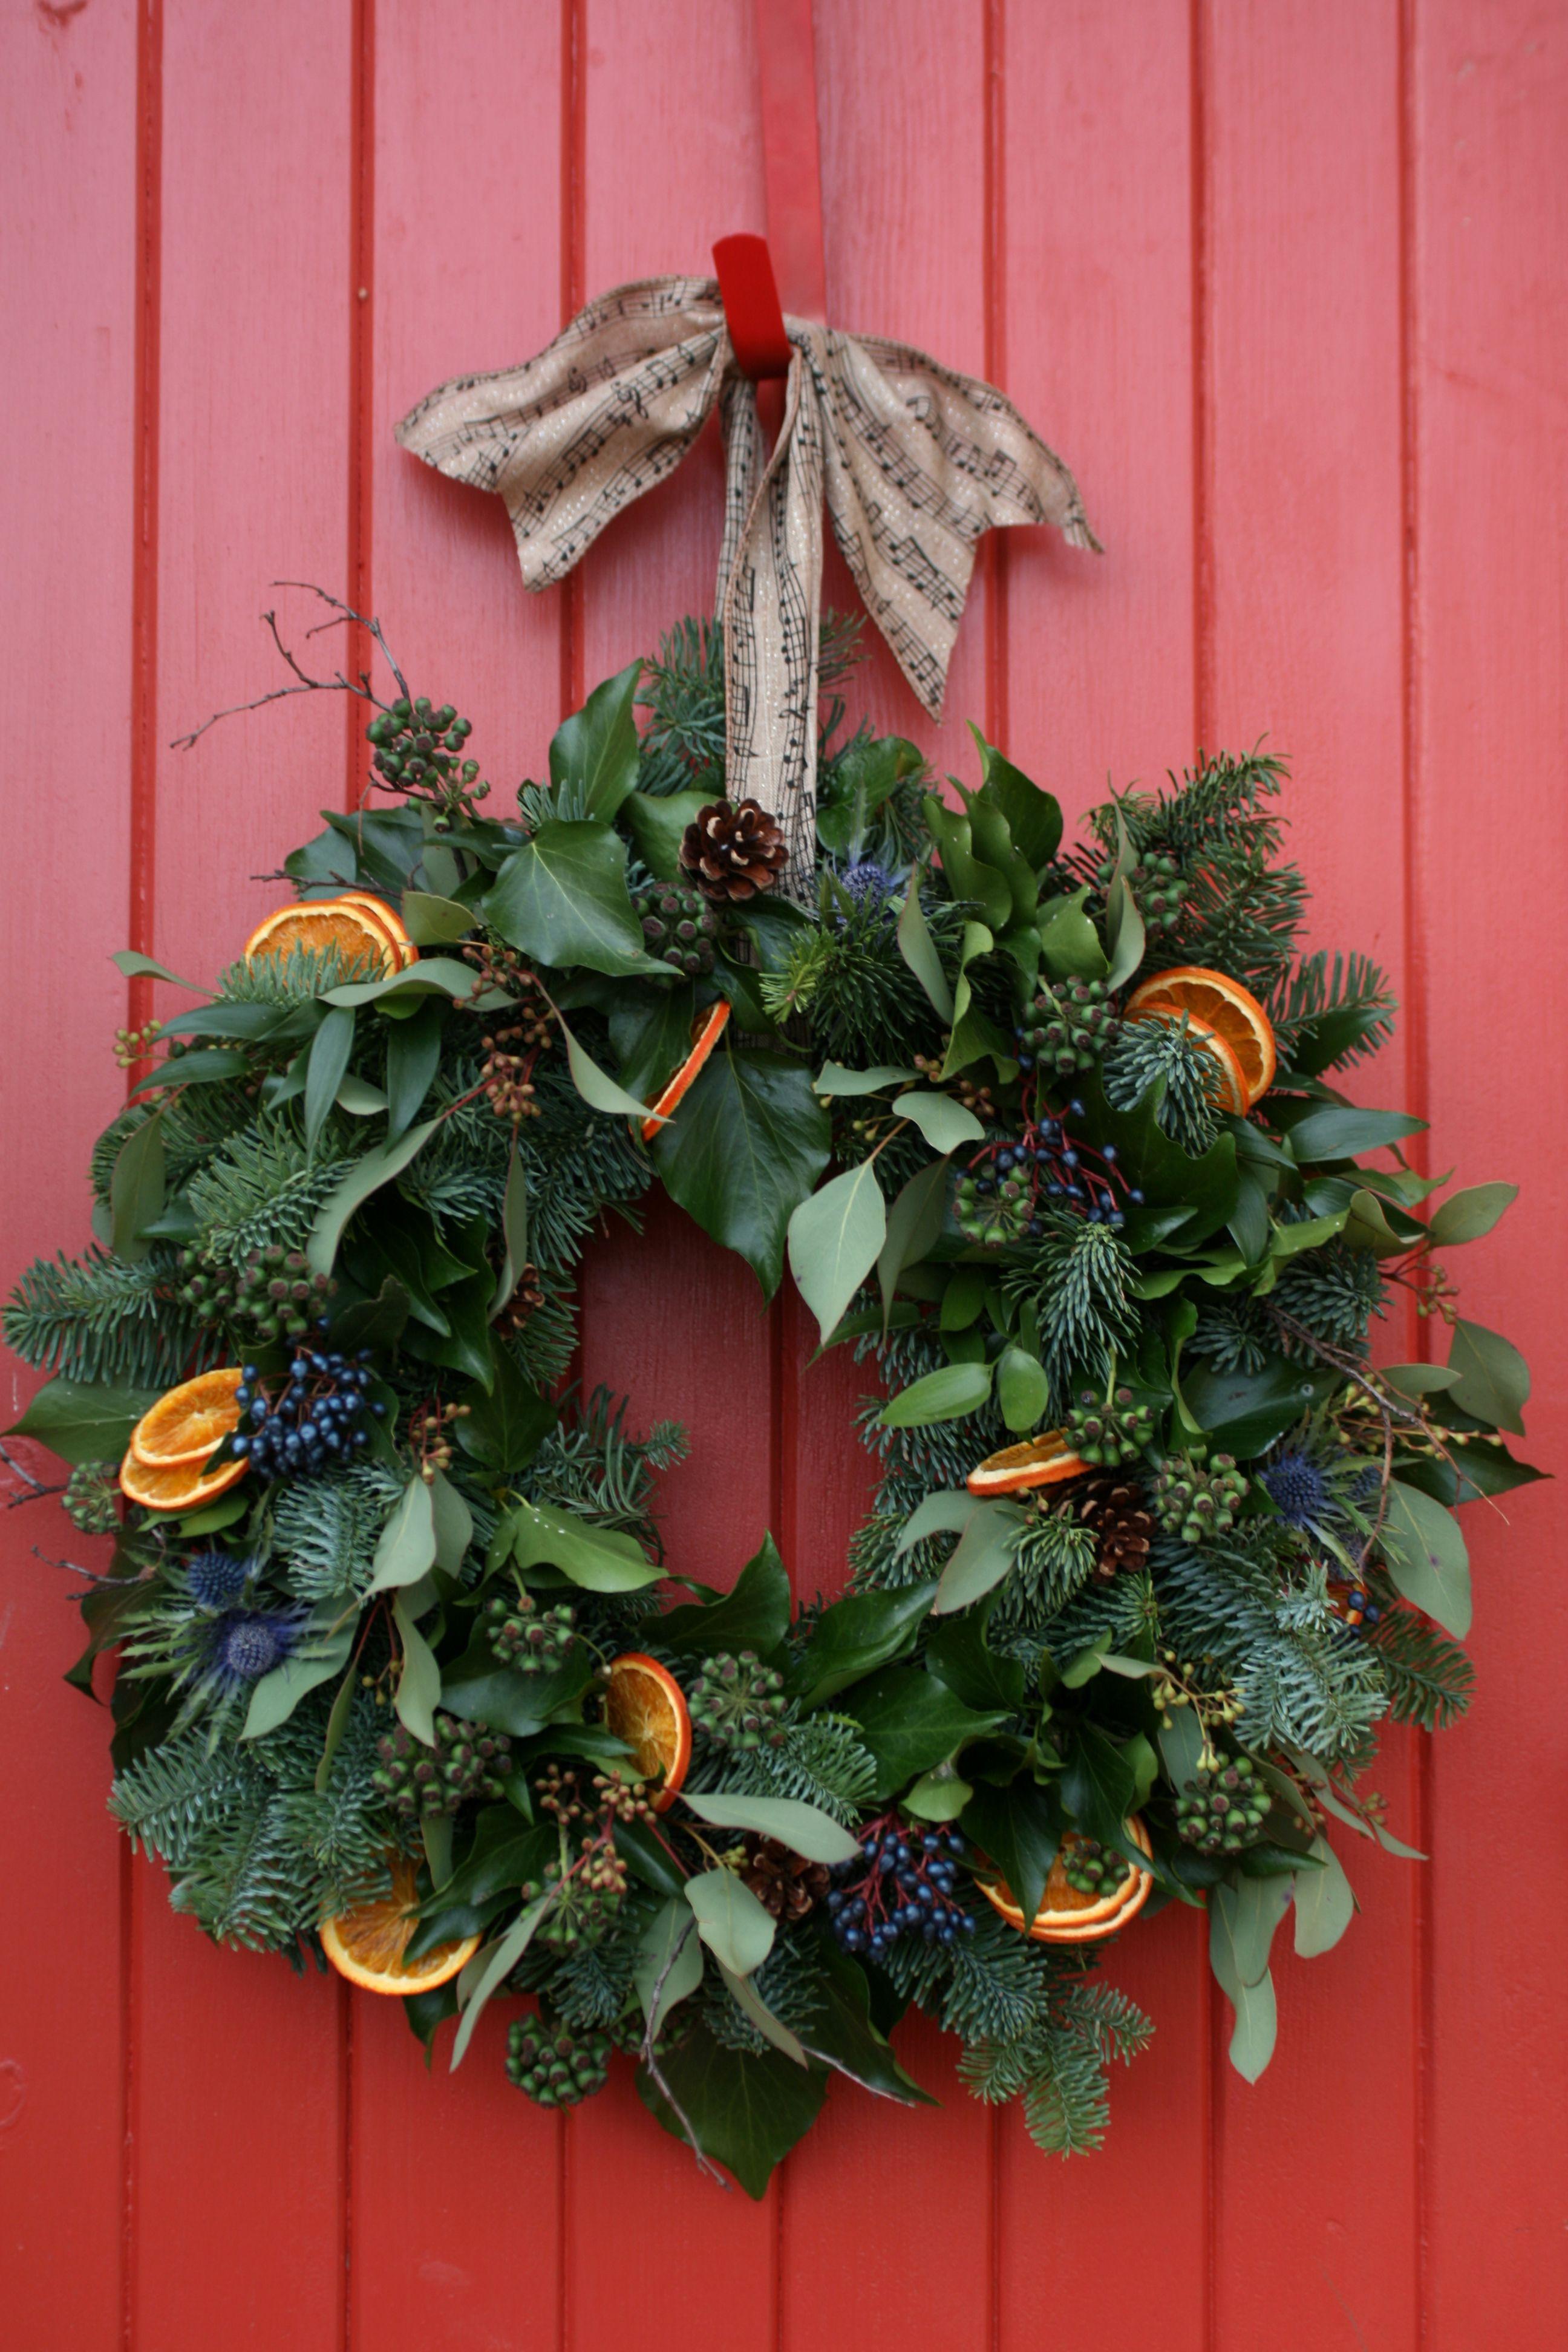 Christmas Wreath With Ivy Viburnum Tinus Eucalyptus